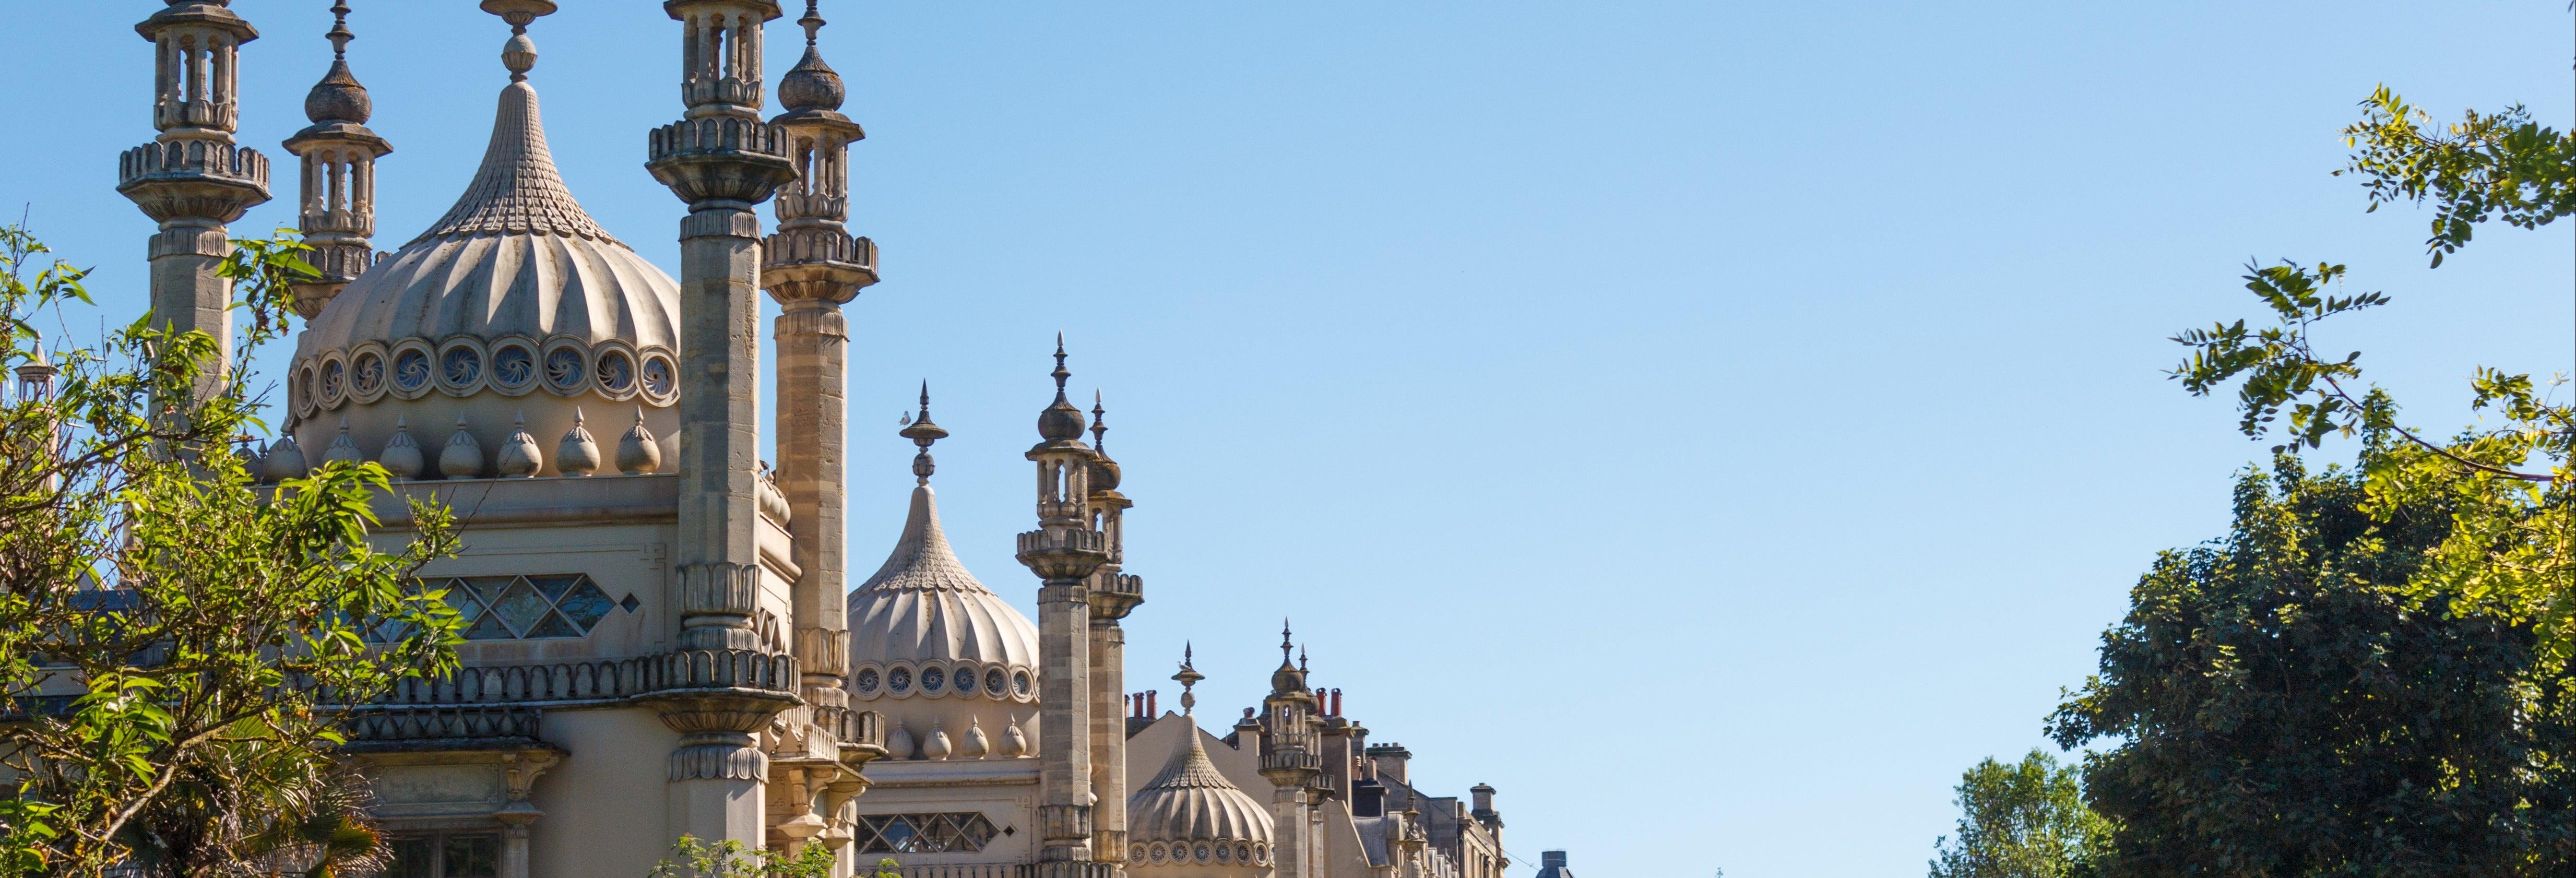 Brighton Royal Pavilion Ticket